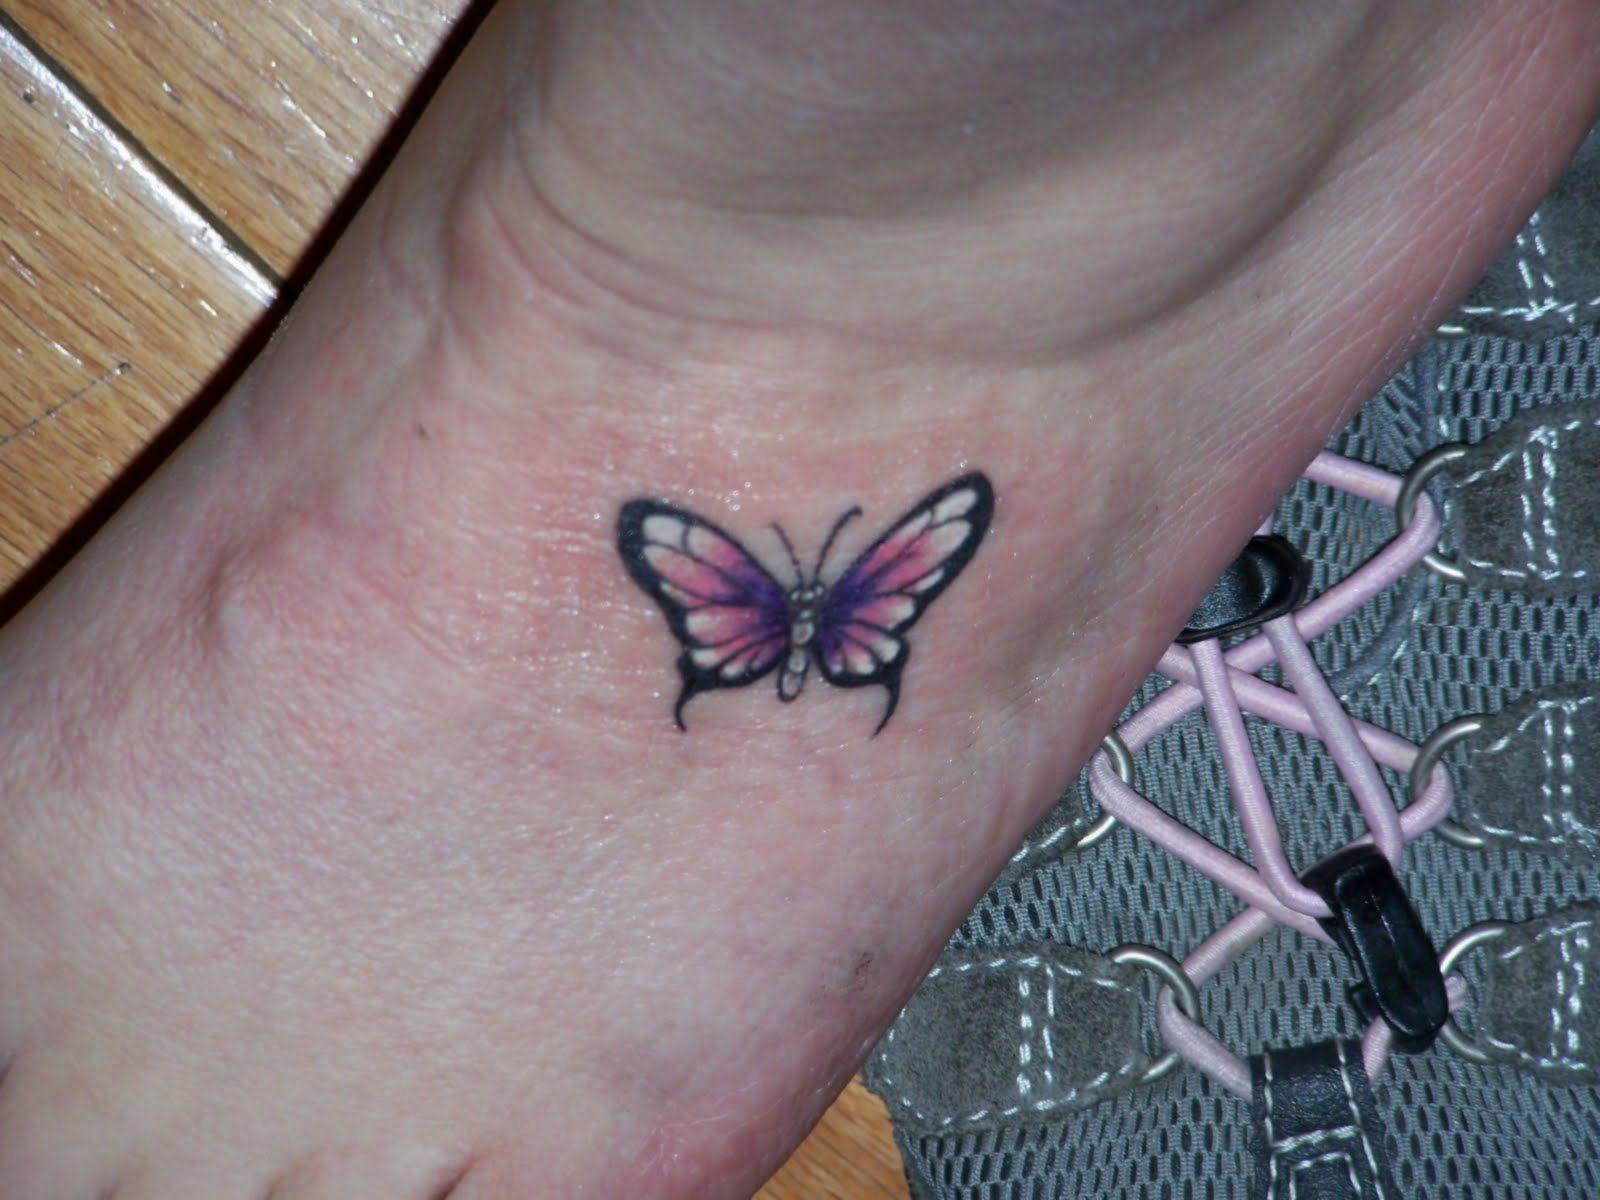 Butterfly star tattoo designs - Butterfly Star Tattoo Butterfly Ankle Tattoos Designs And Ideas